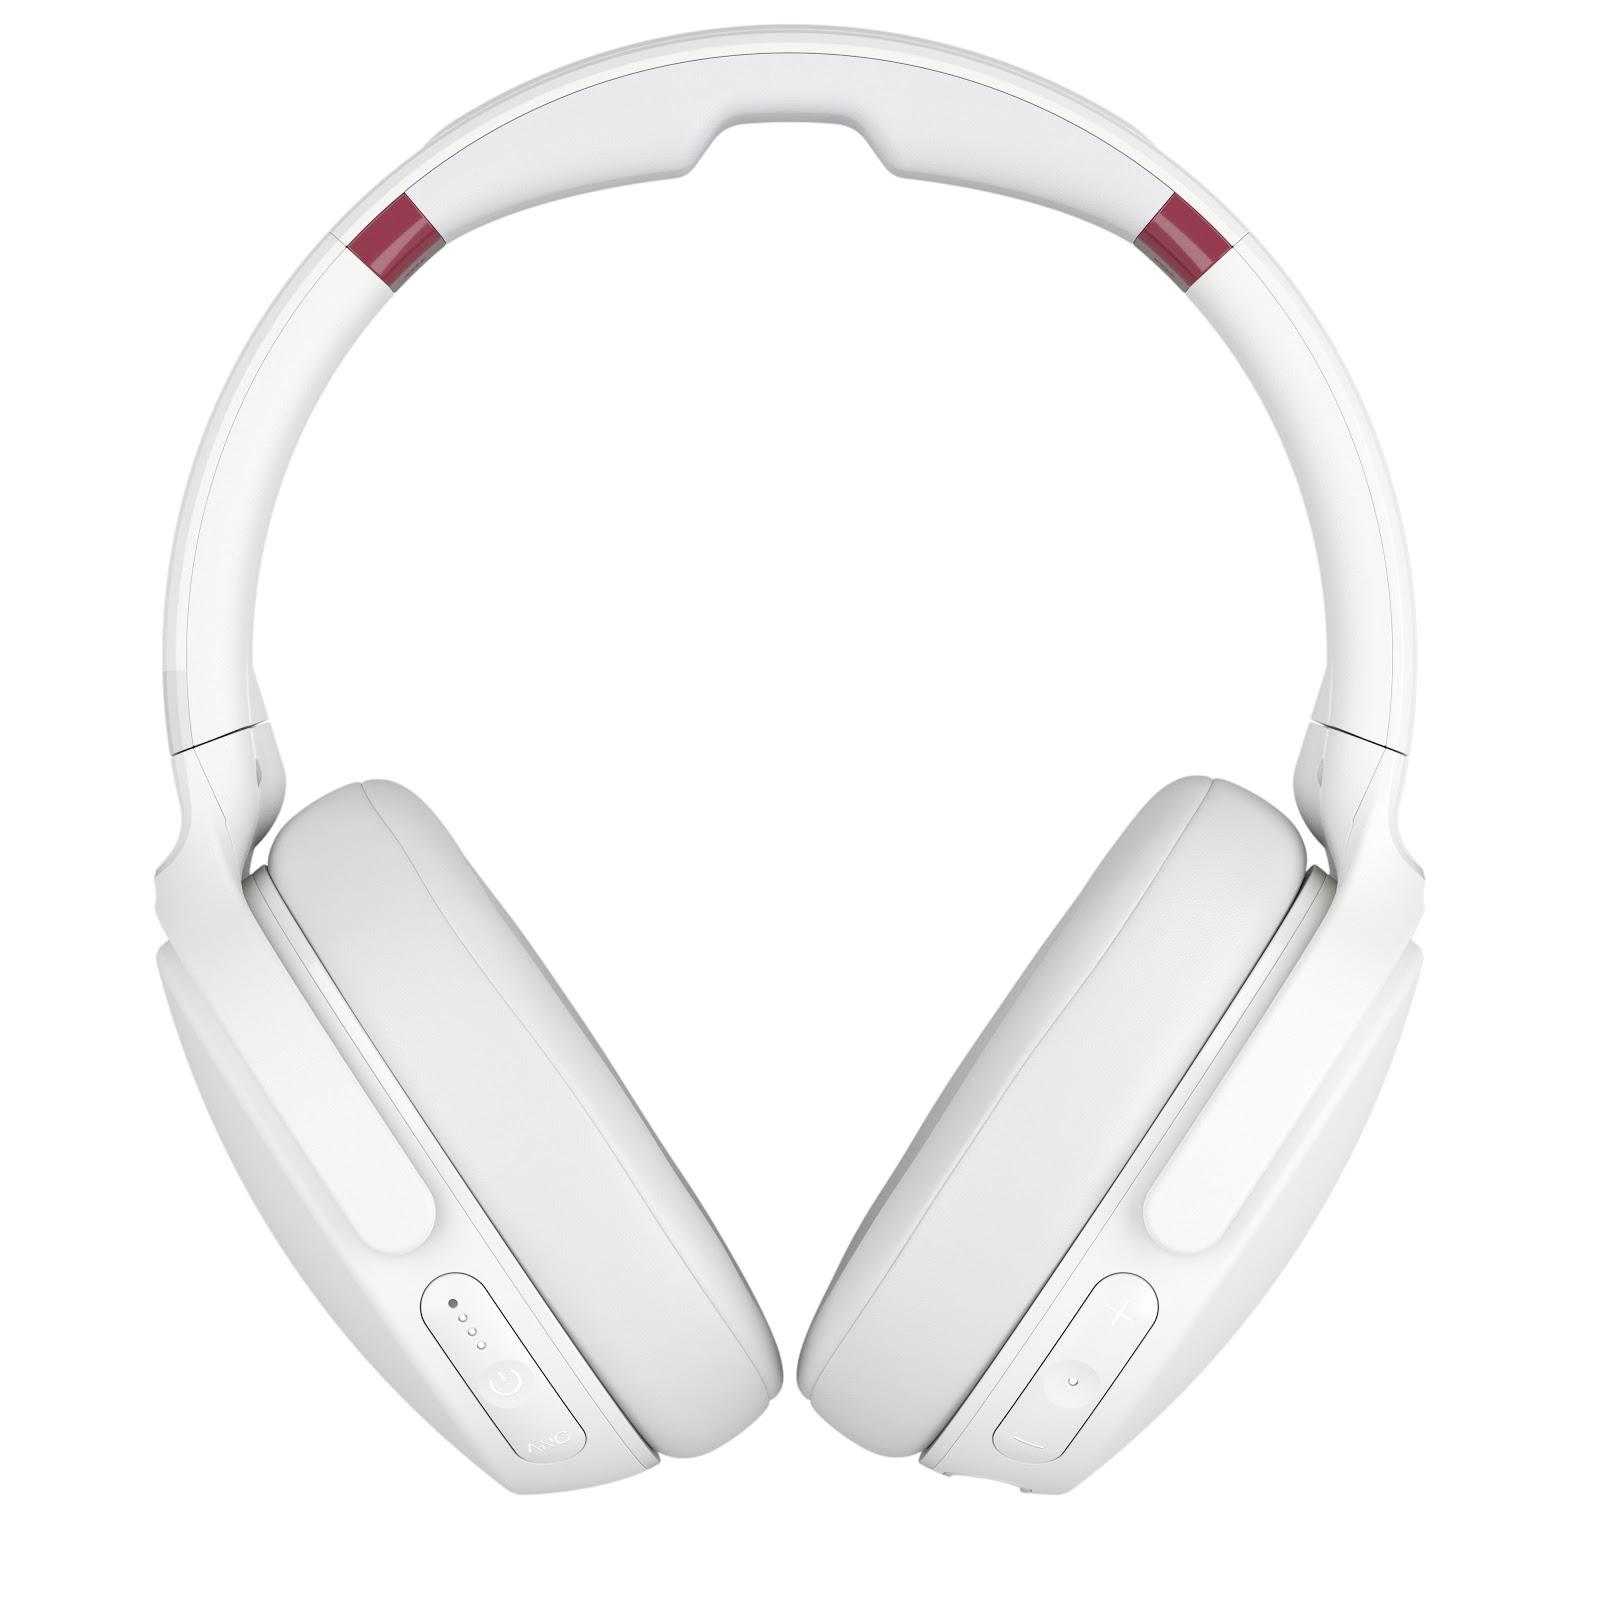 Skullcandy Venue Noise Canceling Wireless Headphones